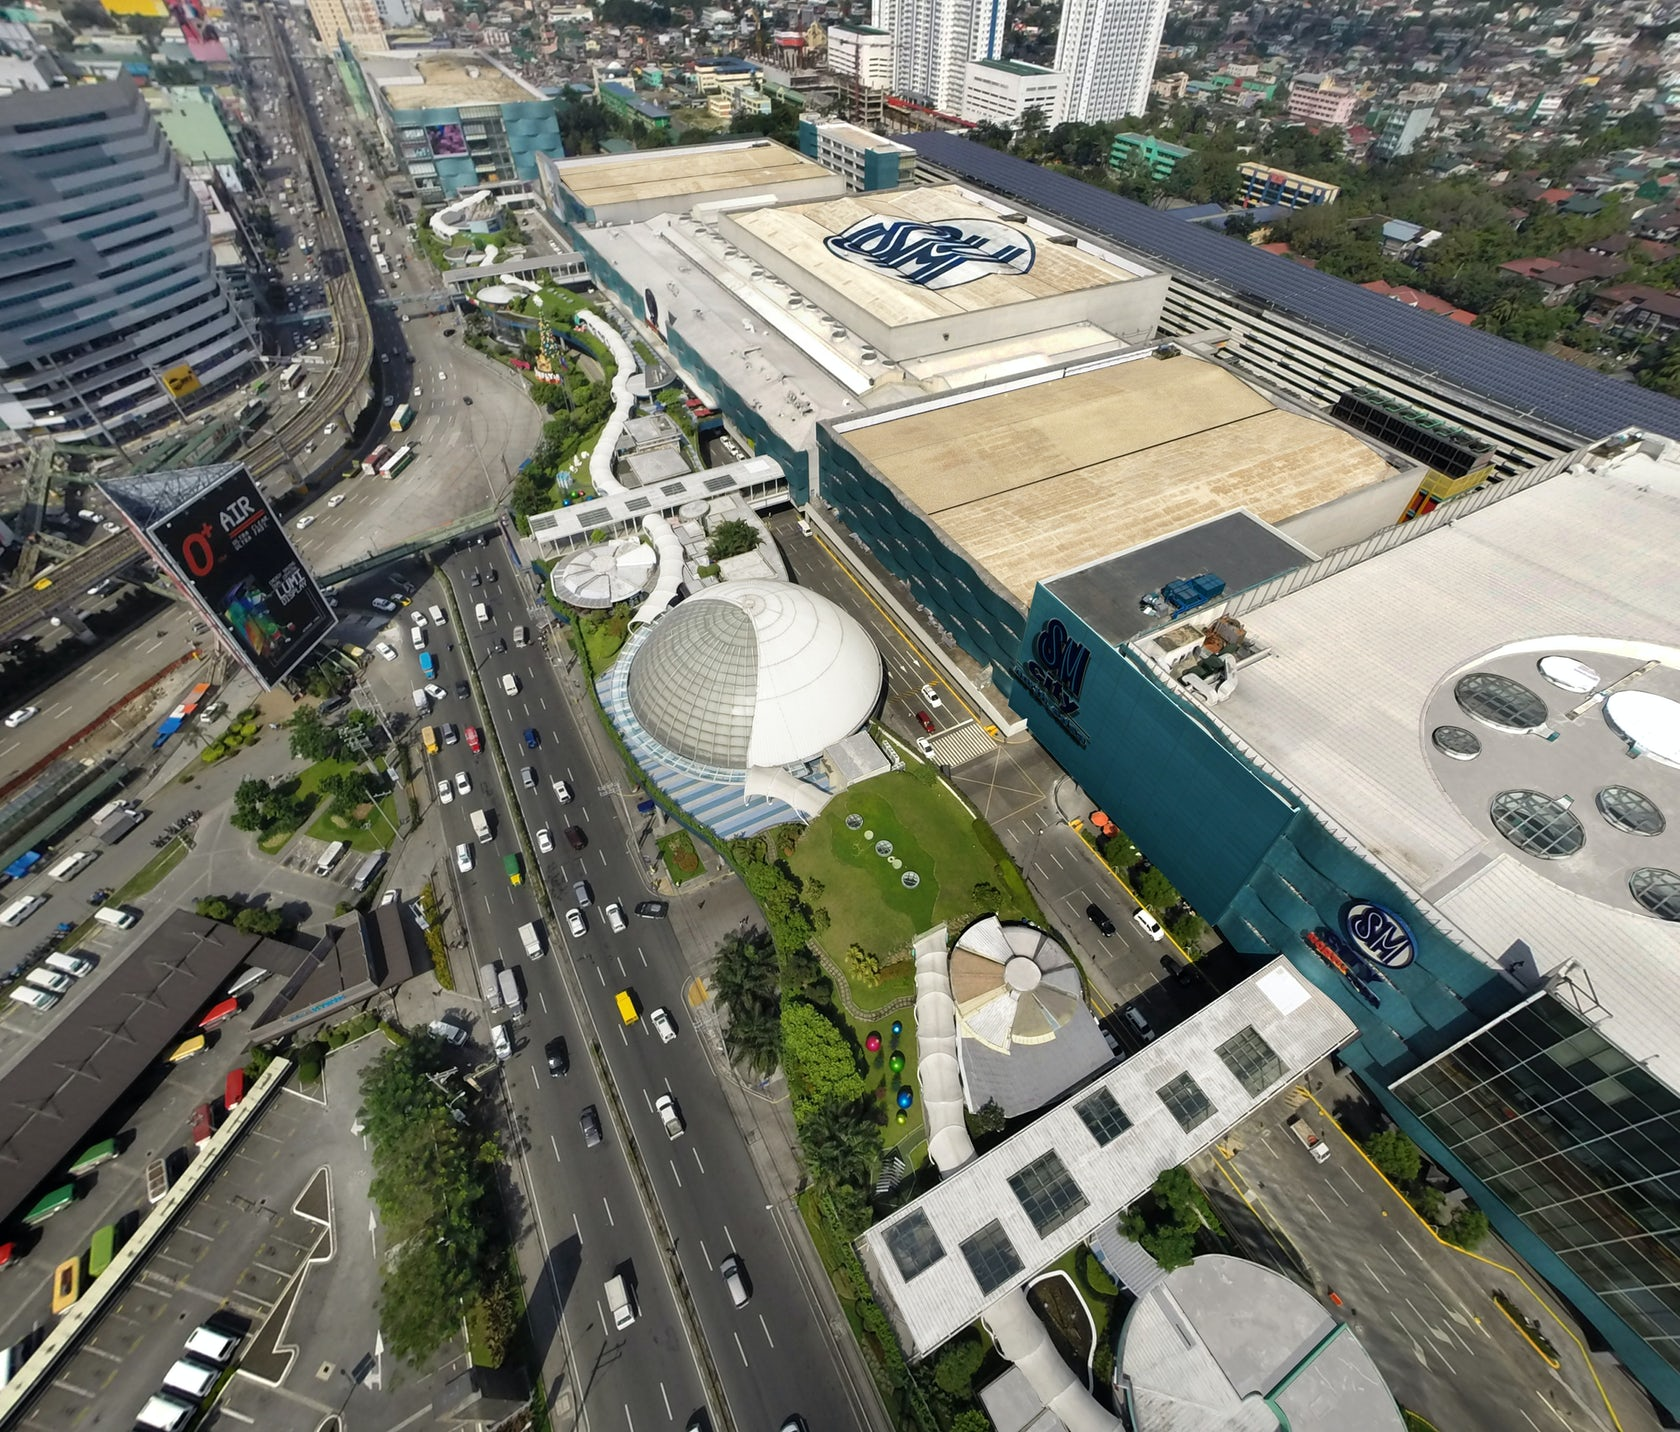 Park Auto Mall >> SM City North EDSA Sky Garden - Architizer